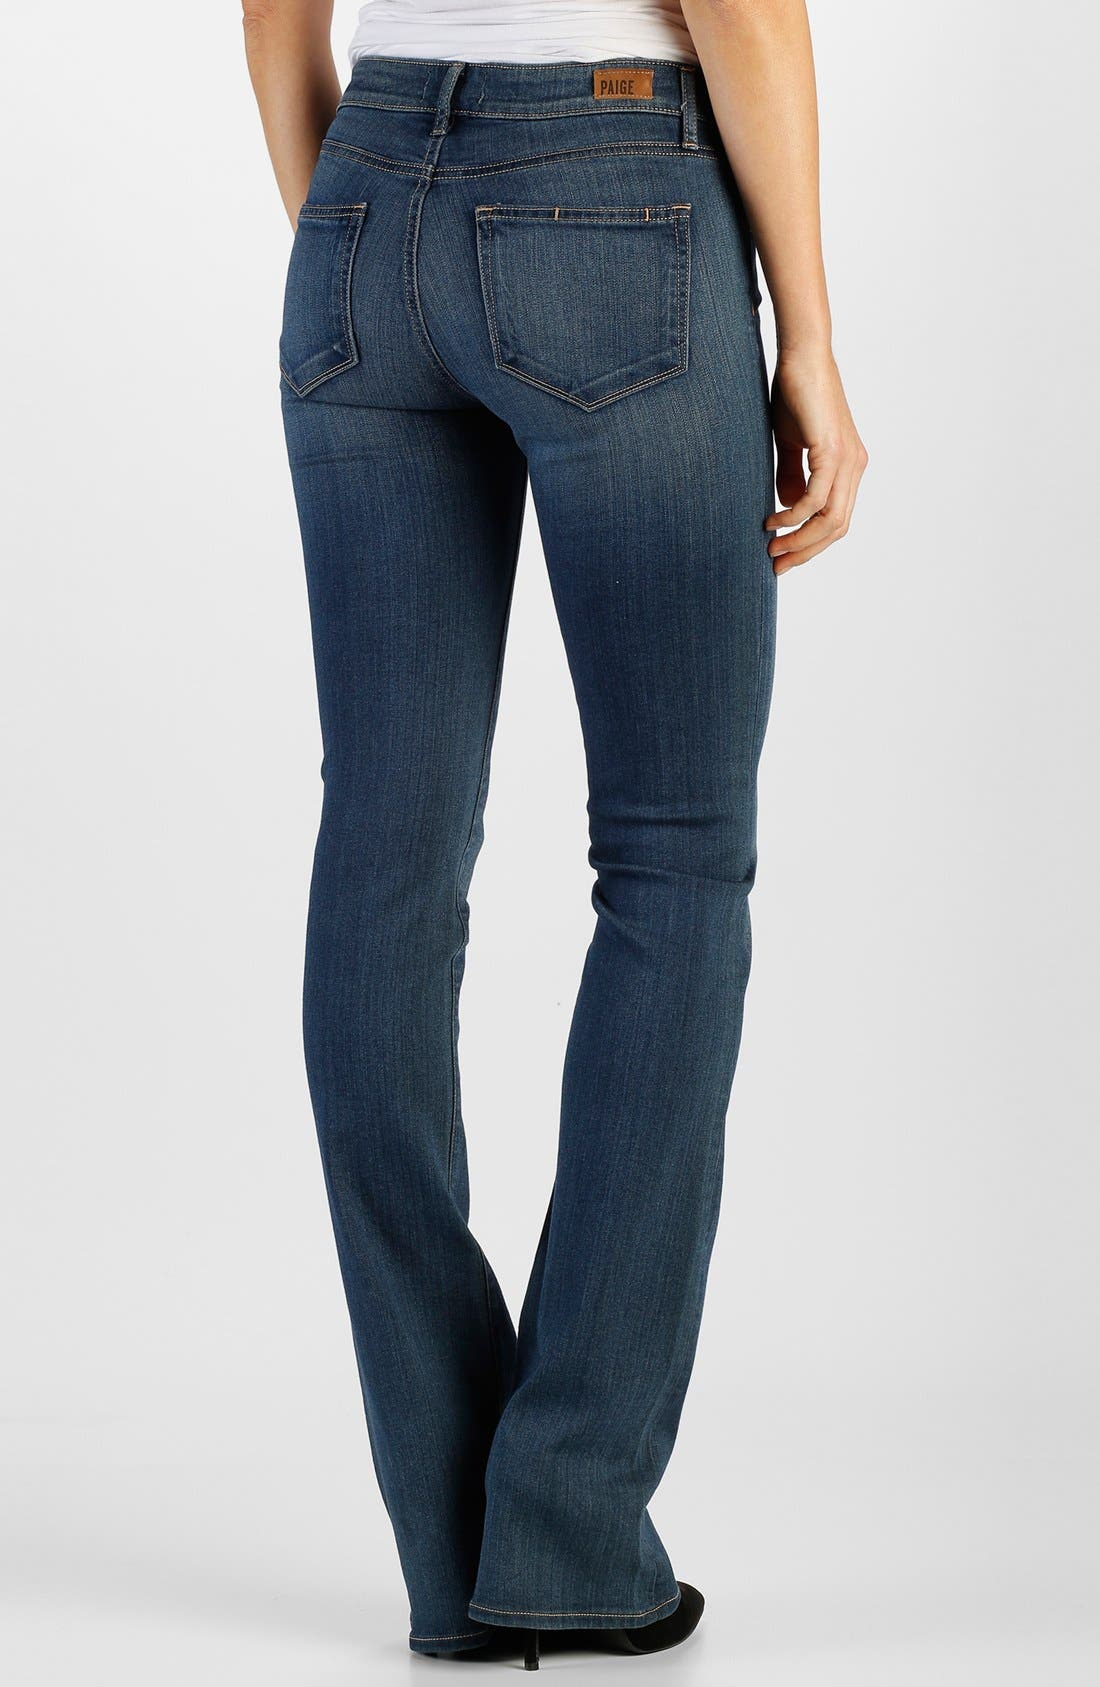 Alternate Image 2  - Paige Denim 'Manhattan' Bootcut Jeans (Lex)